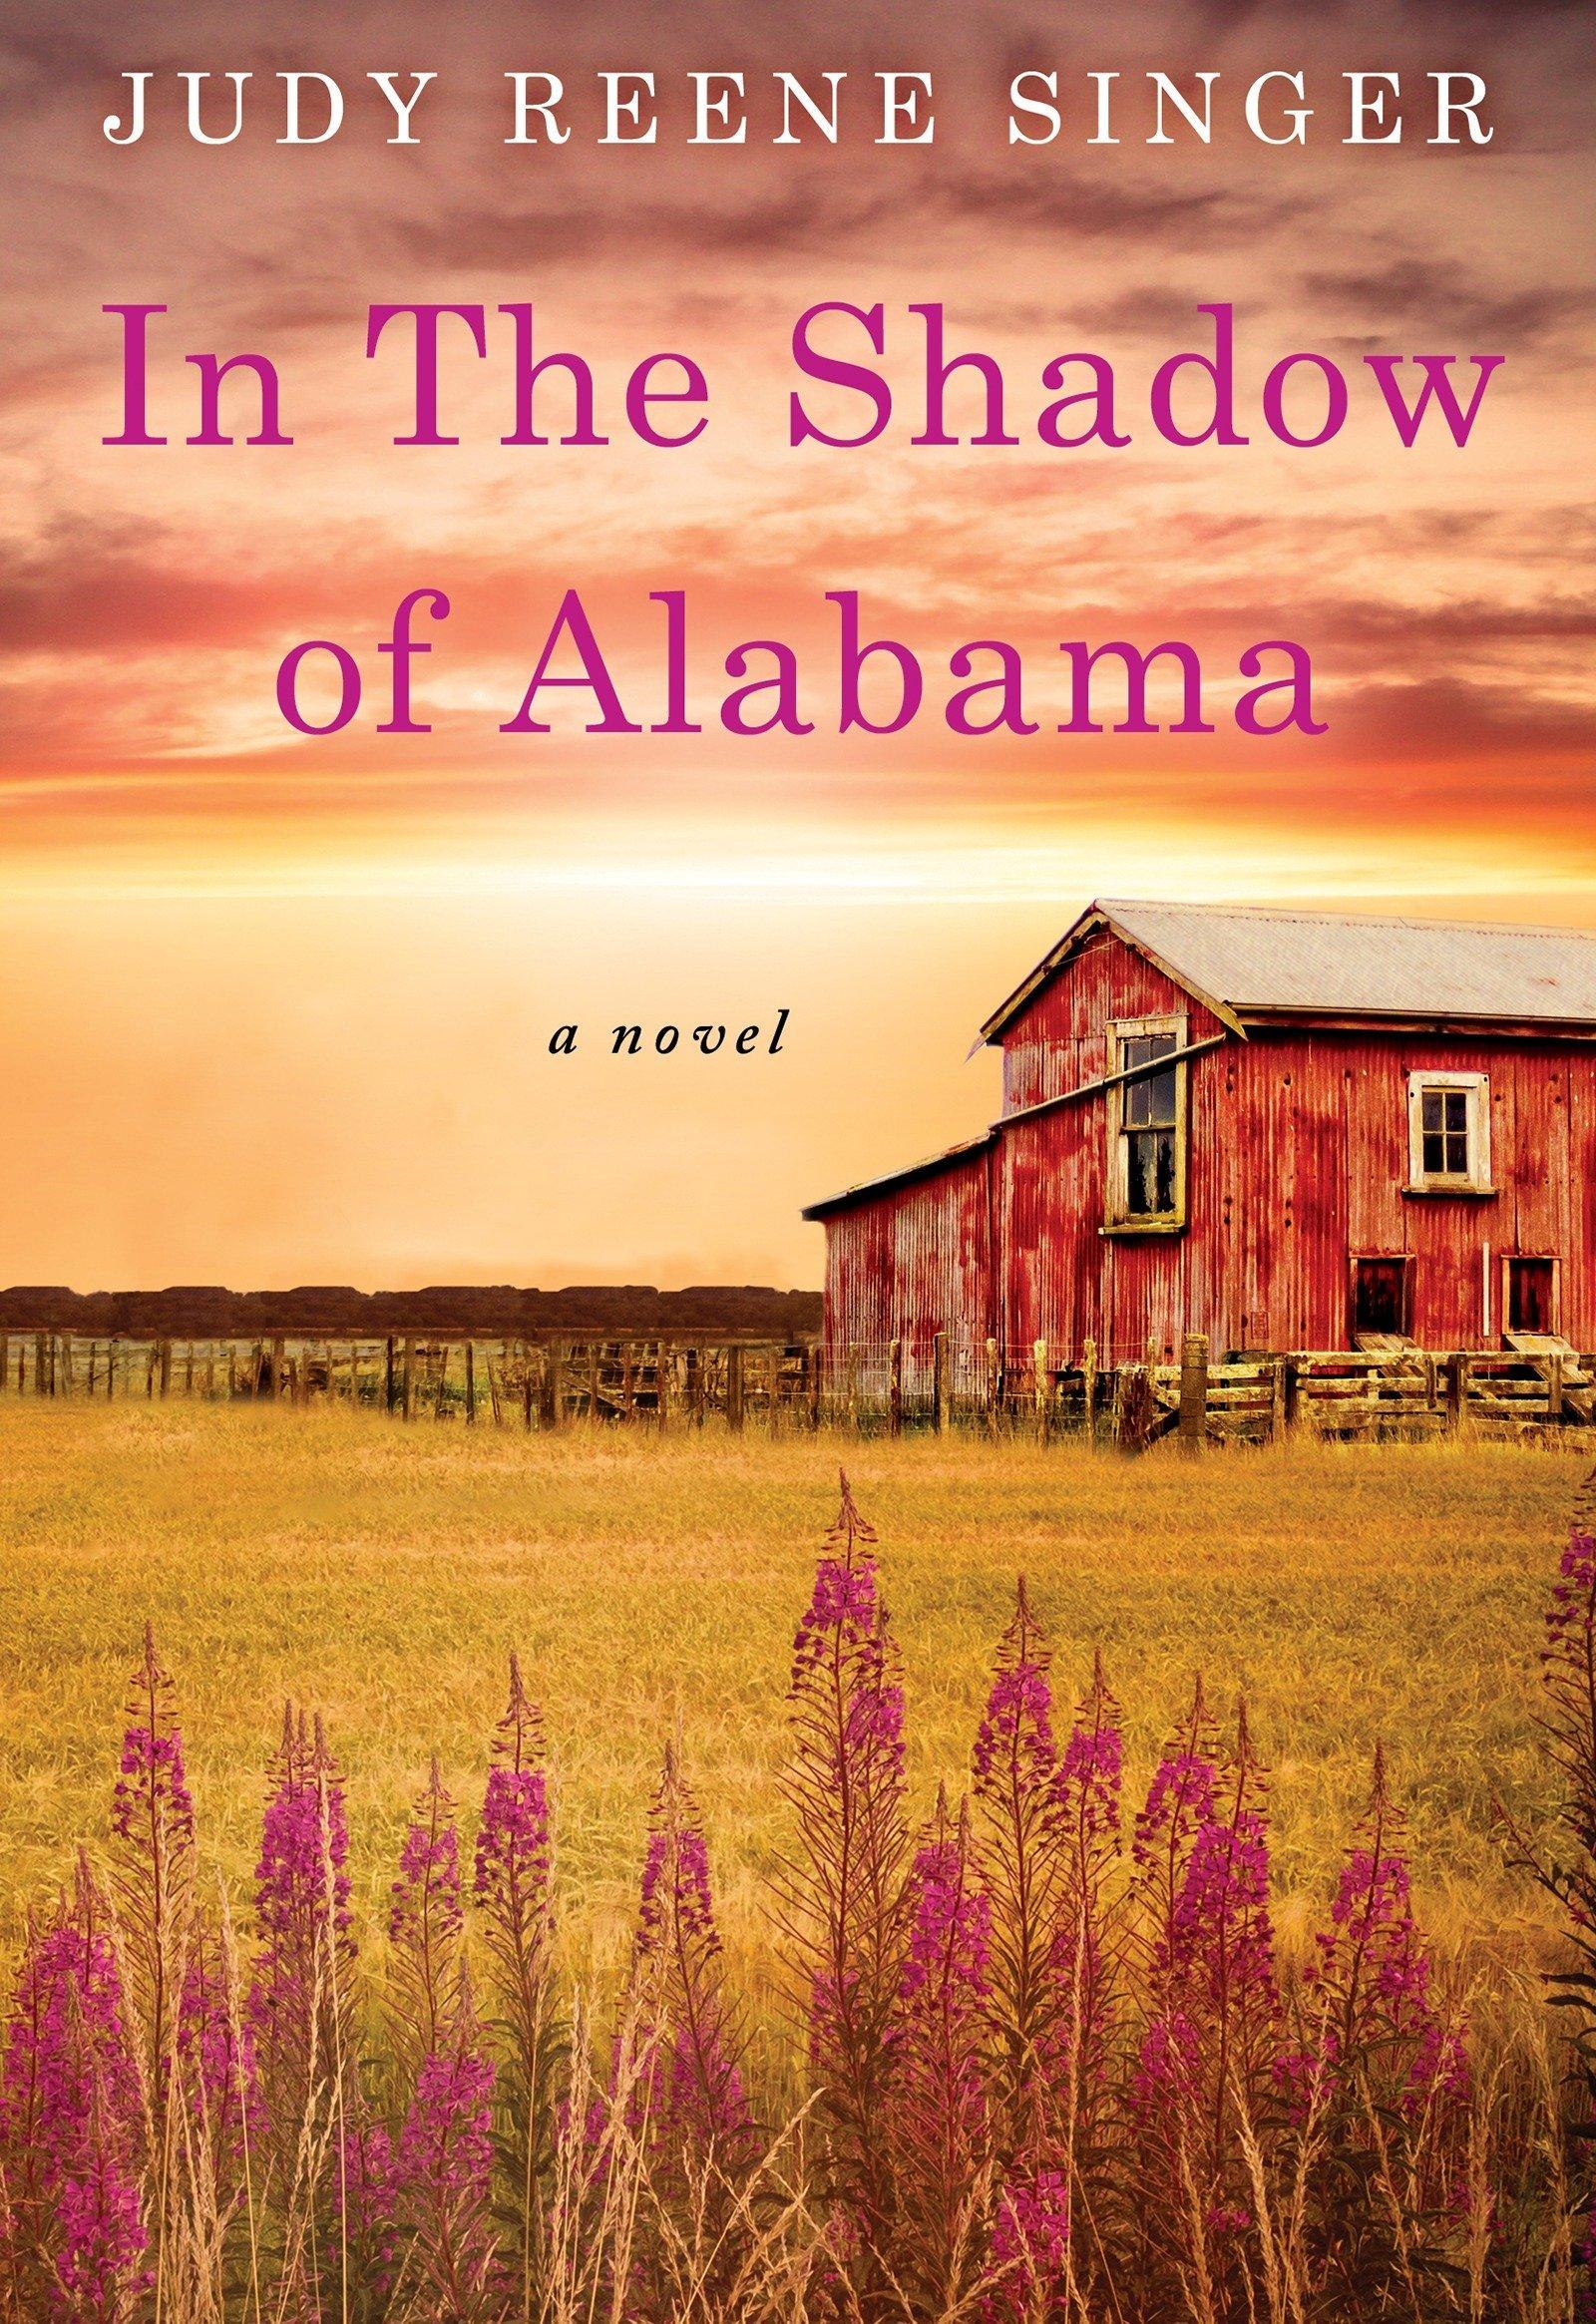 In the Shadow of Alabama.jpg